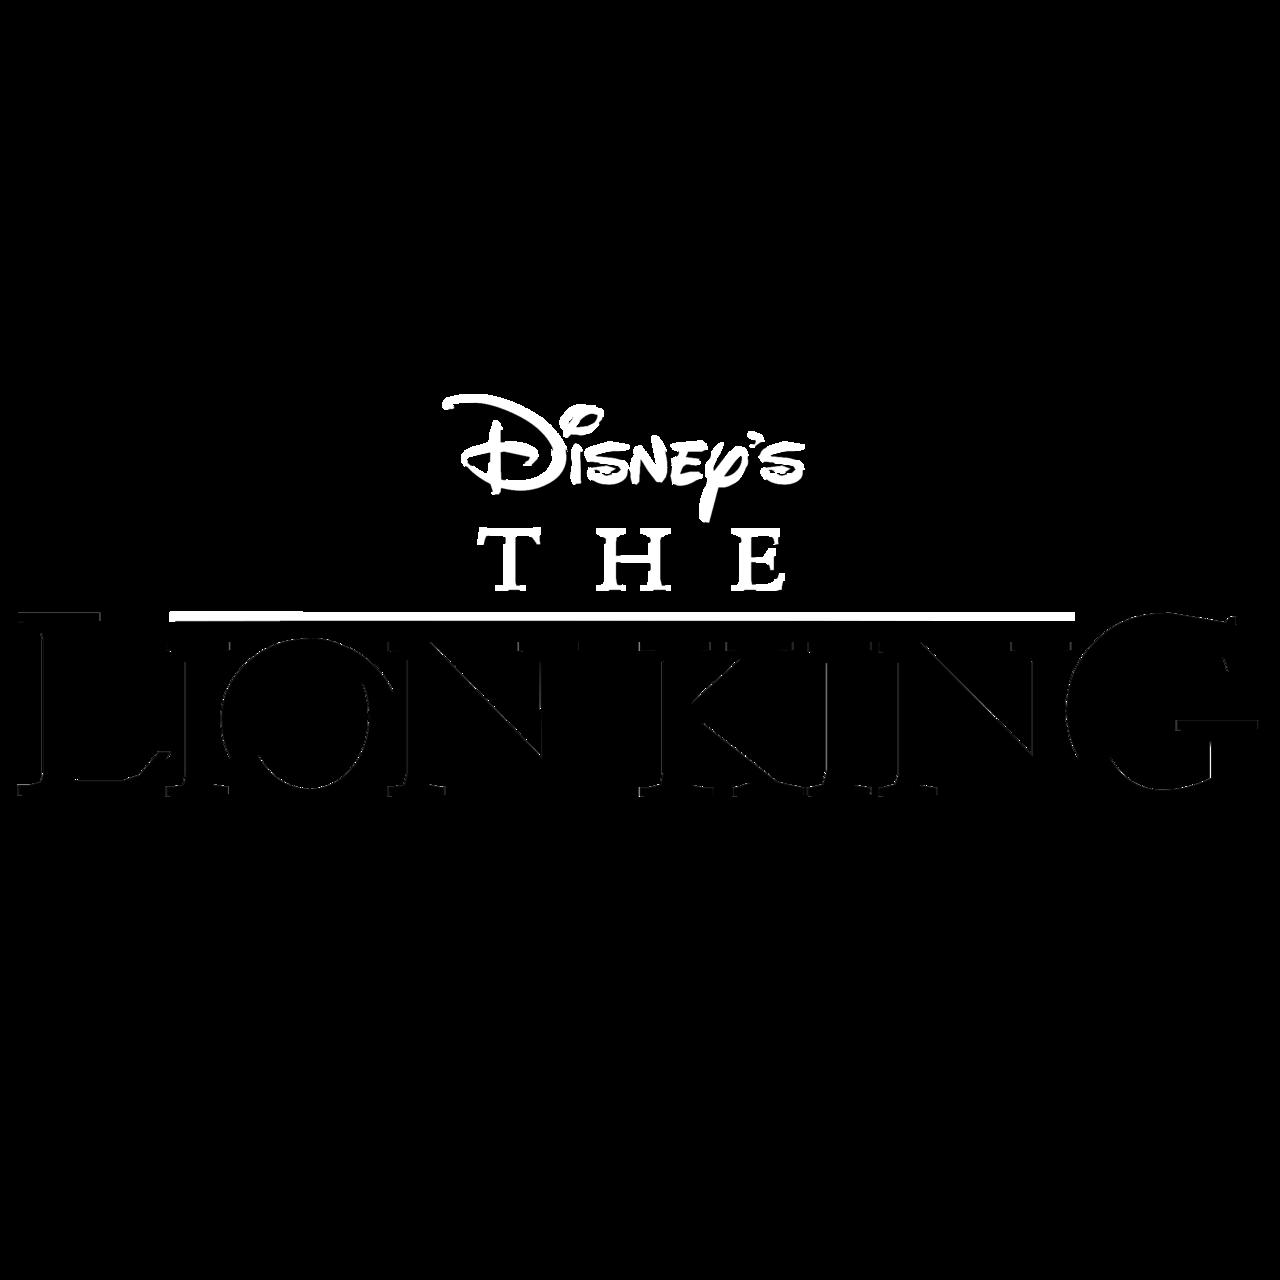 Disney S The Lion King Logo Black And White Brands Logos